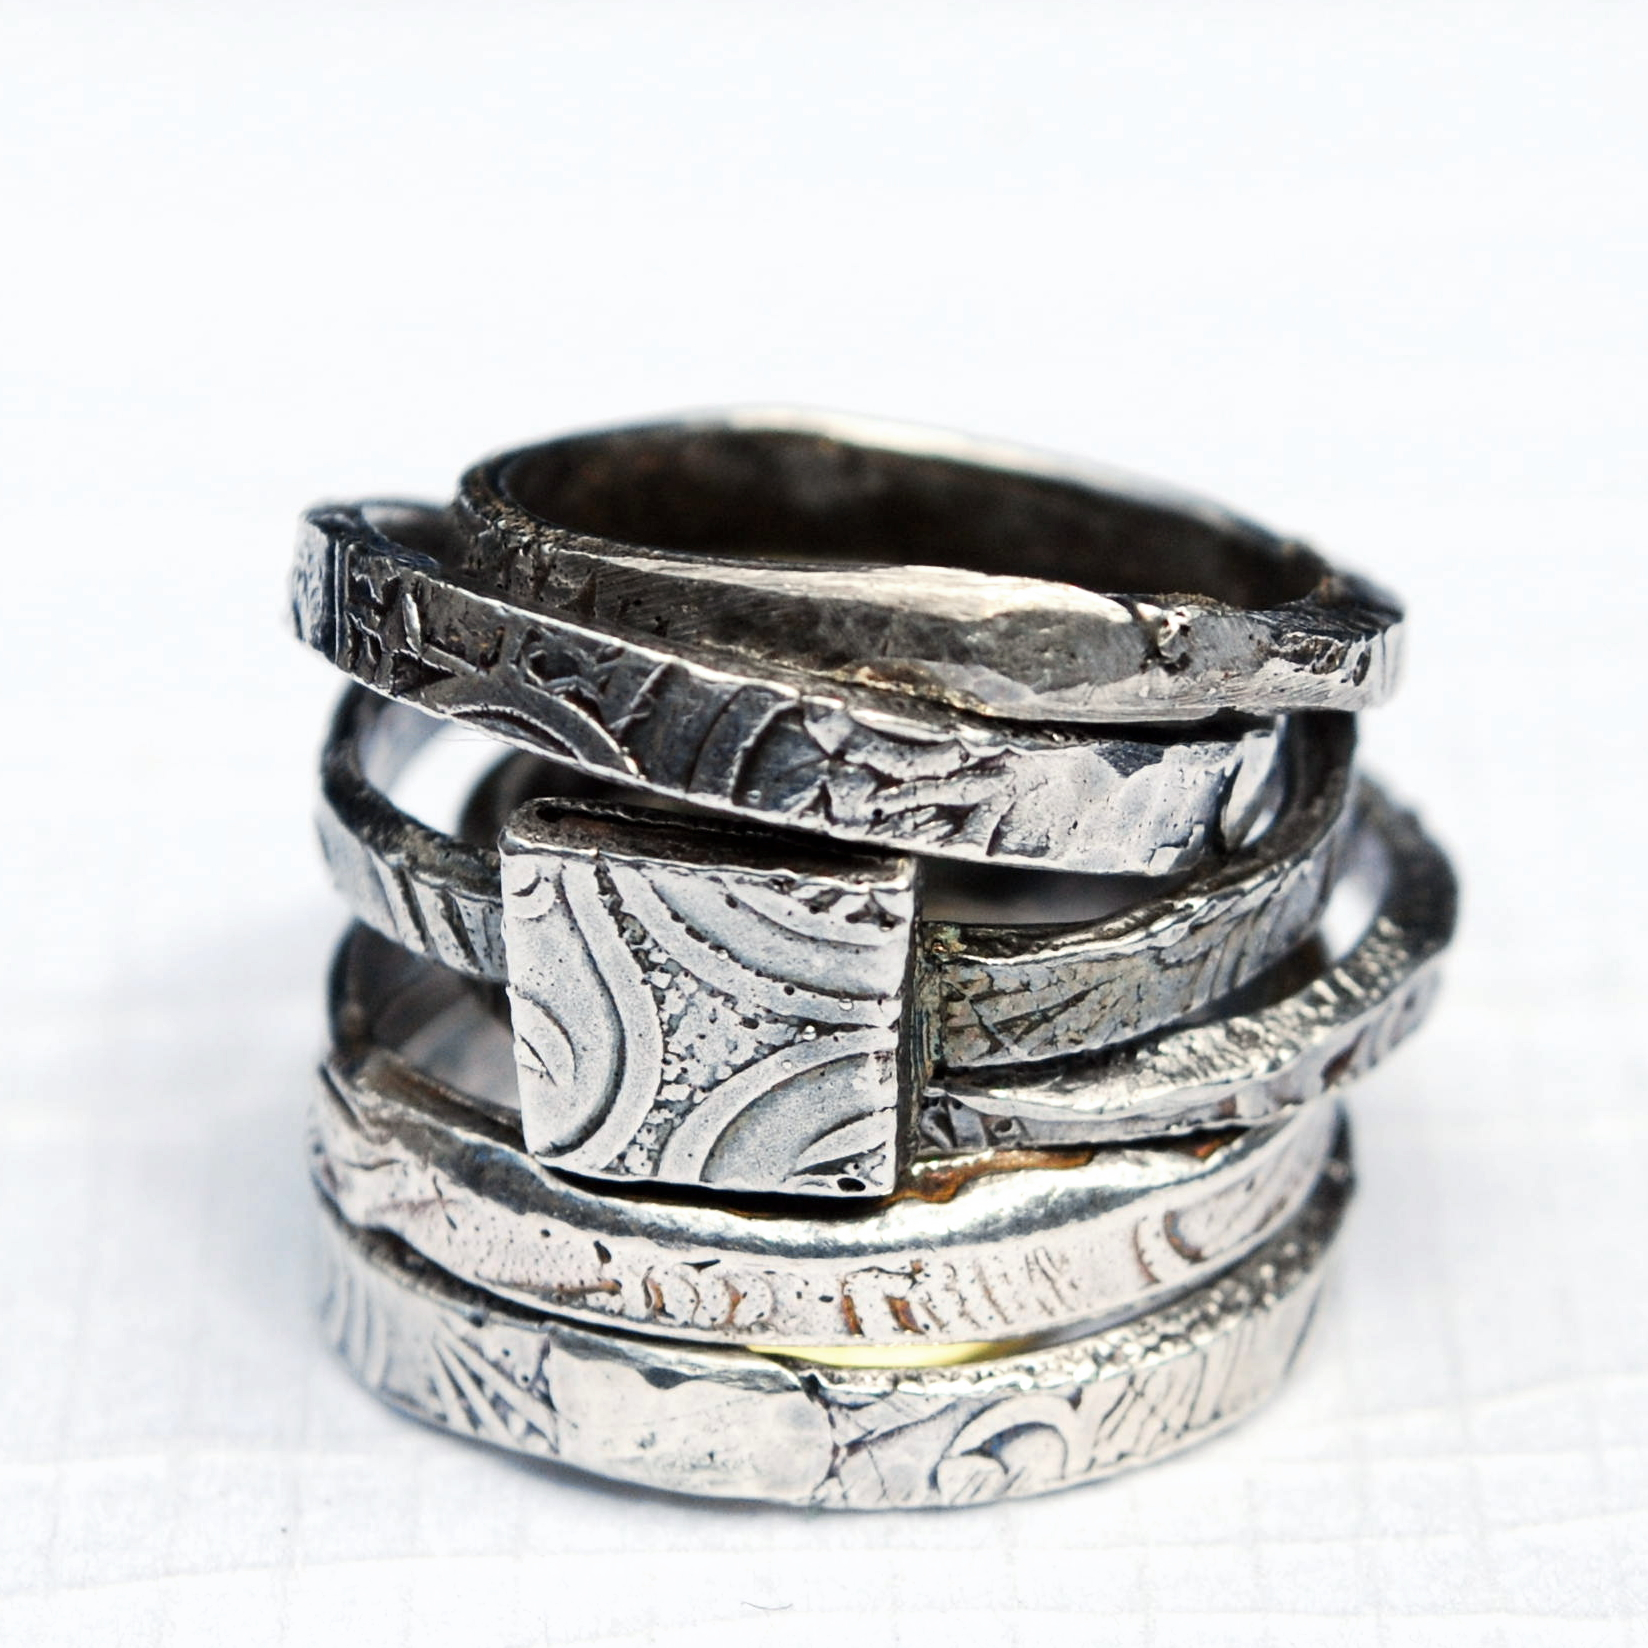 artefact - 180419 - tea ring stack 01.jpg